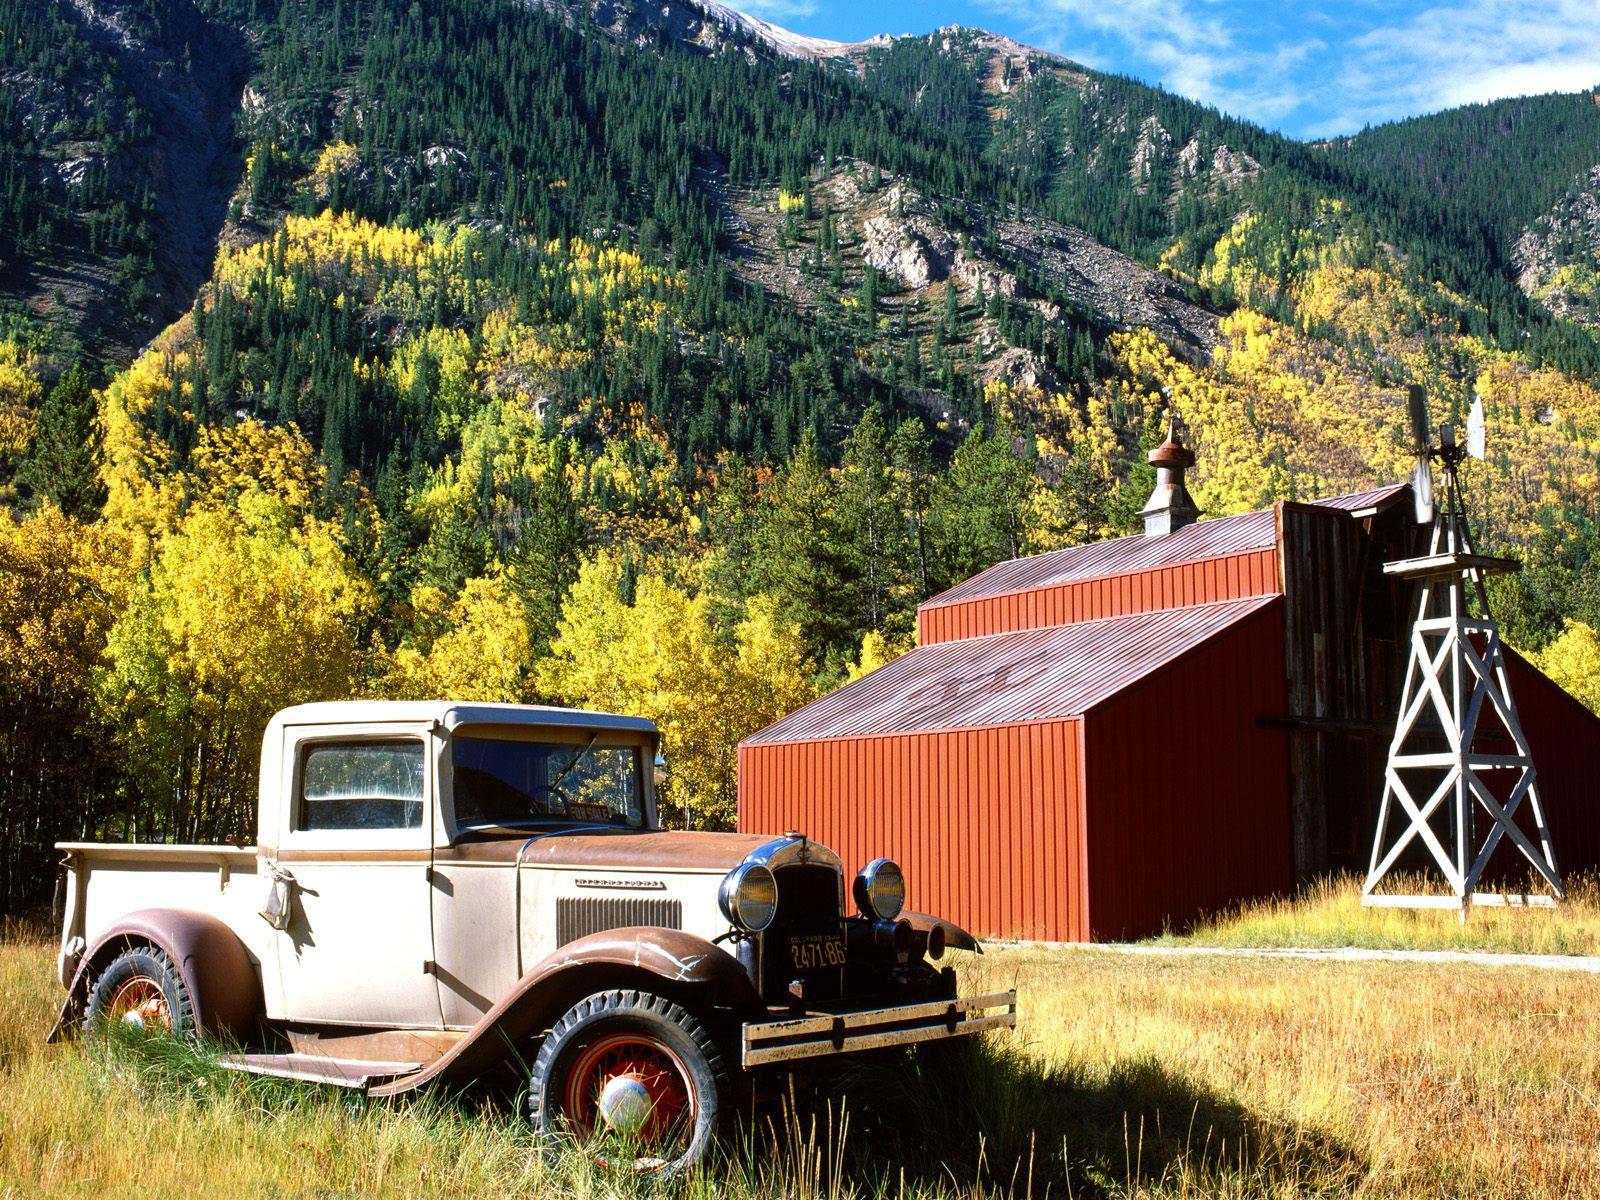 Desktop wallpaper downloads Old cars   Huge collection of amazing 1600x1200